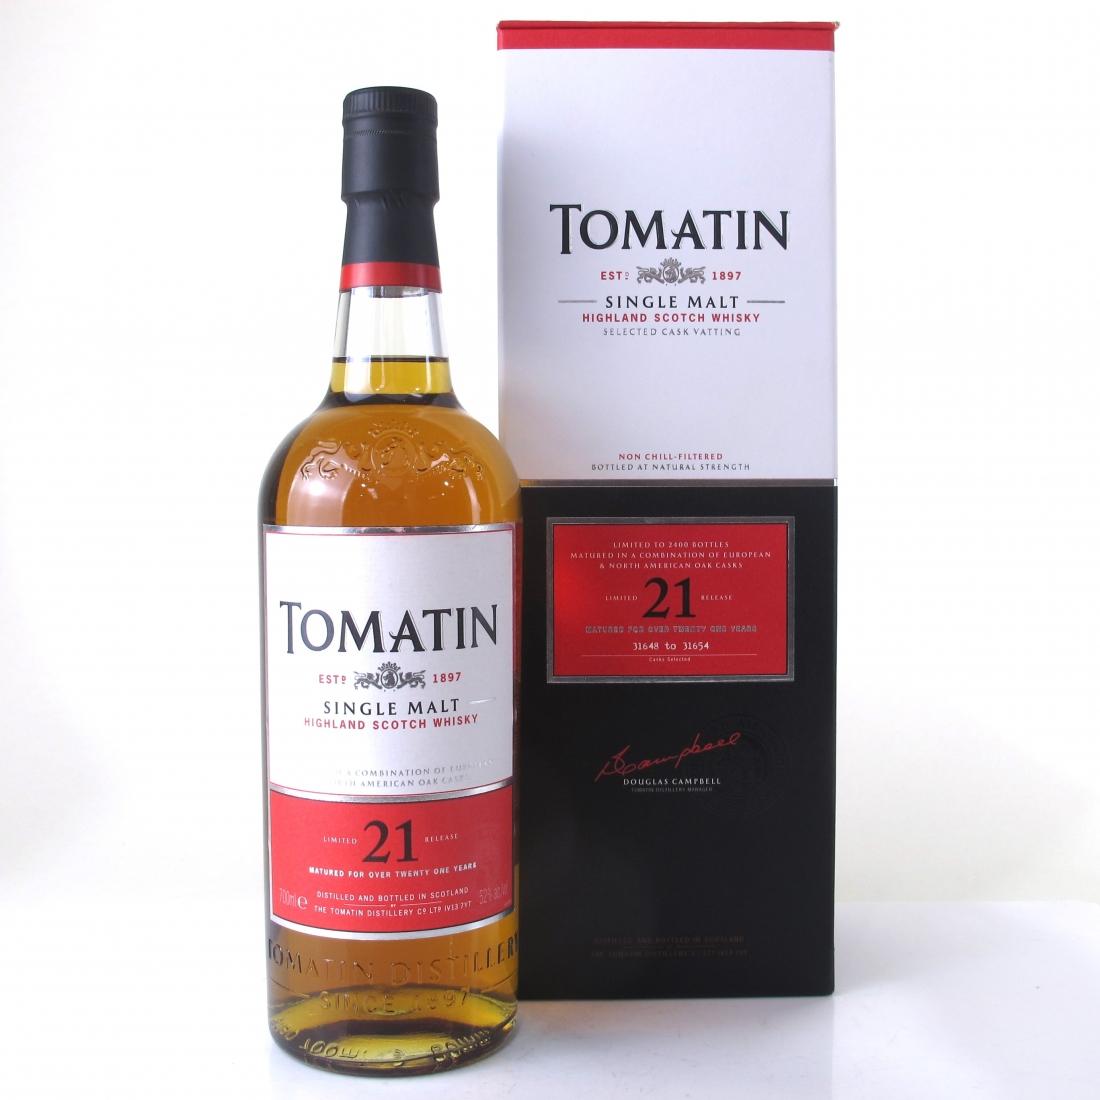 Tomatin 21 Year Old